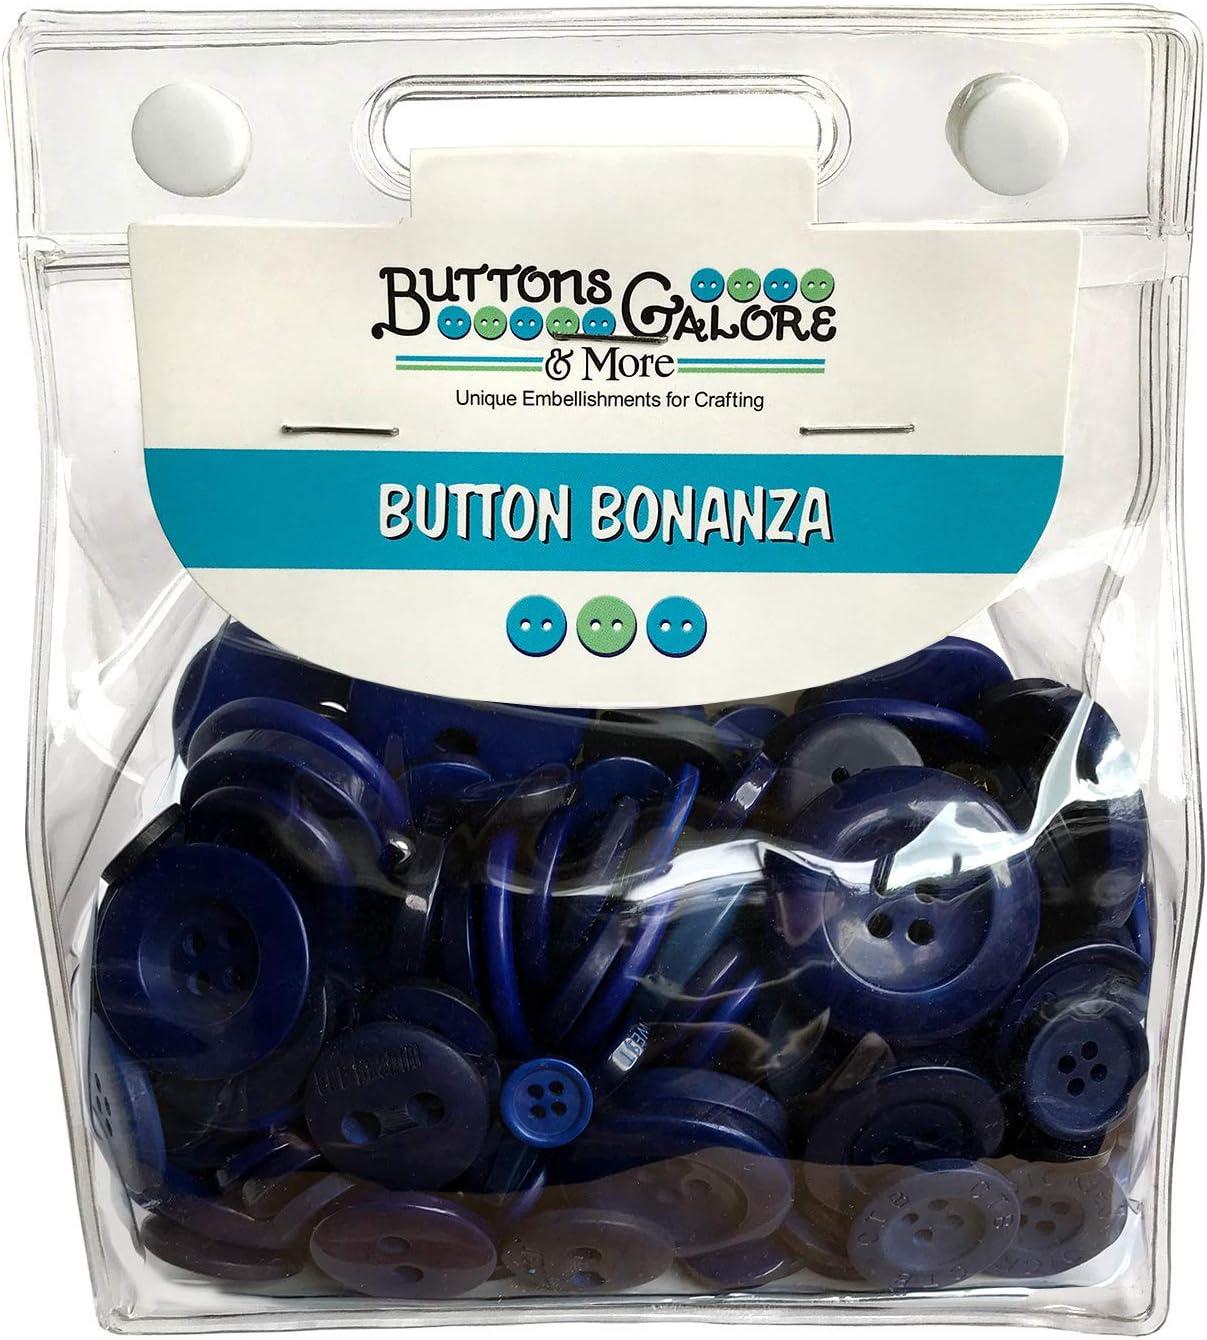 Bittersweet Buttons Galore BB66 Button Bonanza